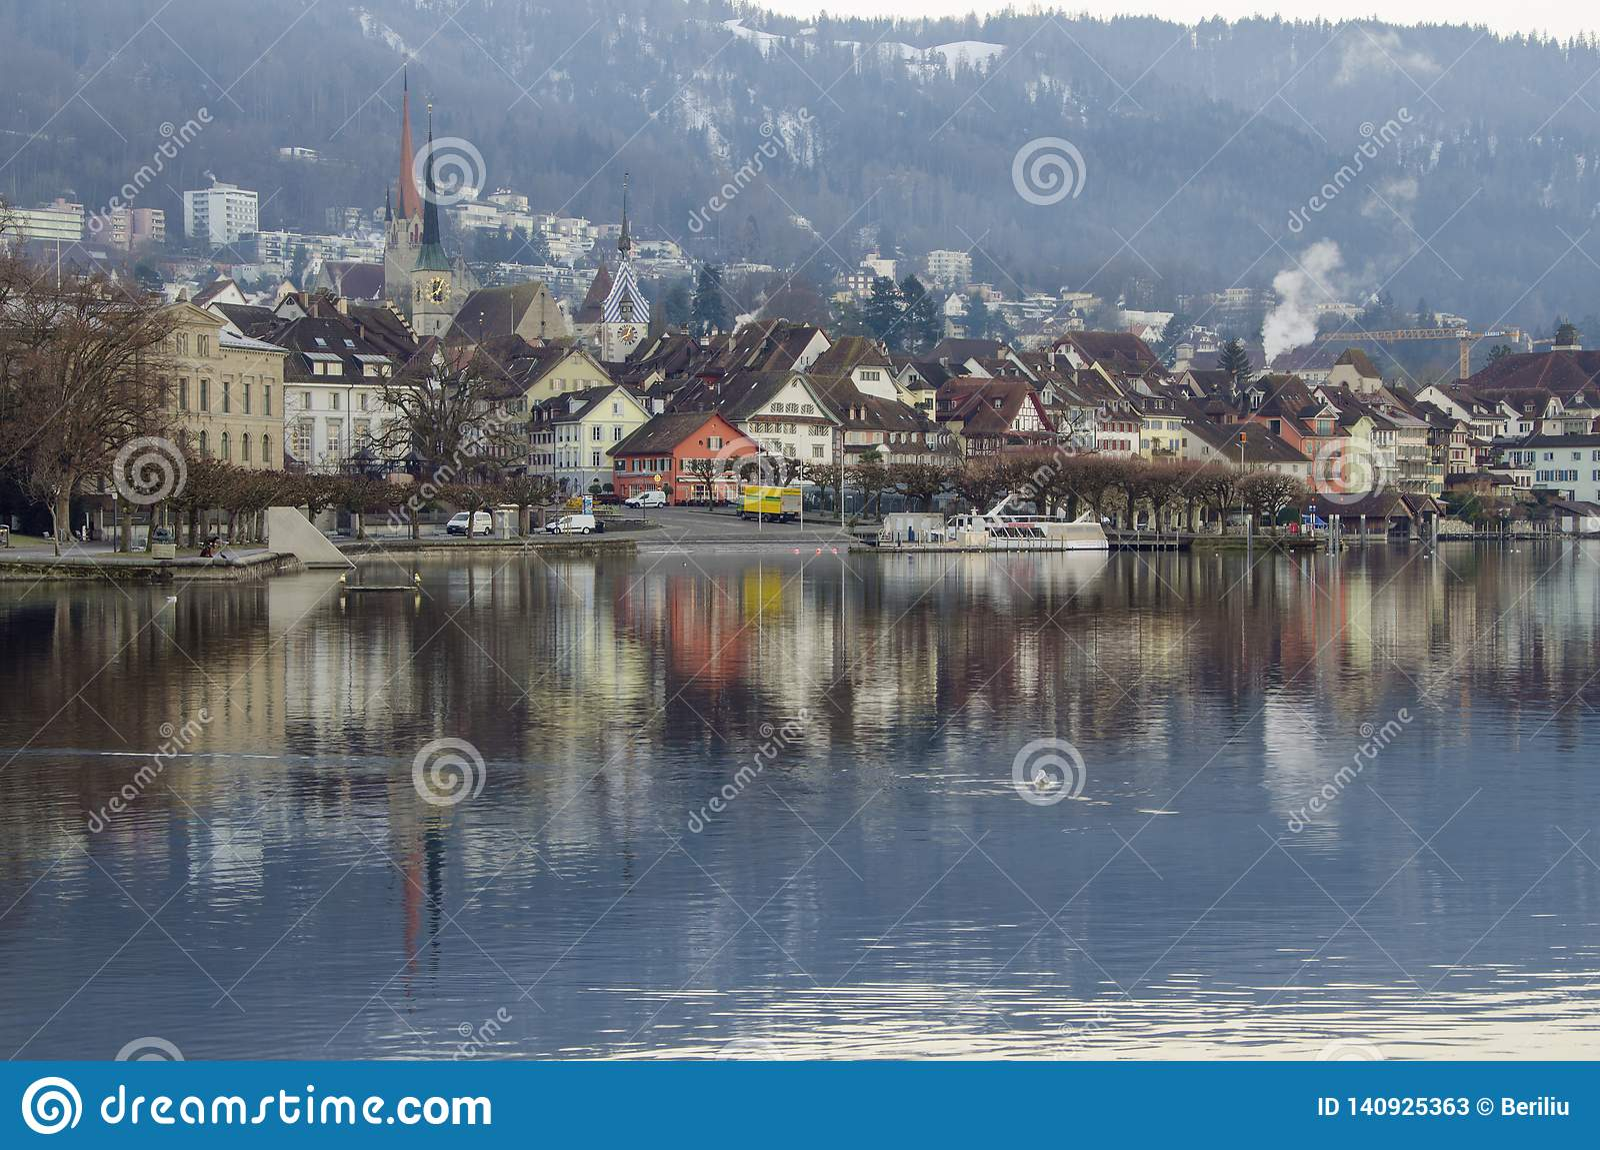 Town of Zug, Switzerland stock image. Image of pier - 140925363